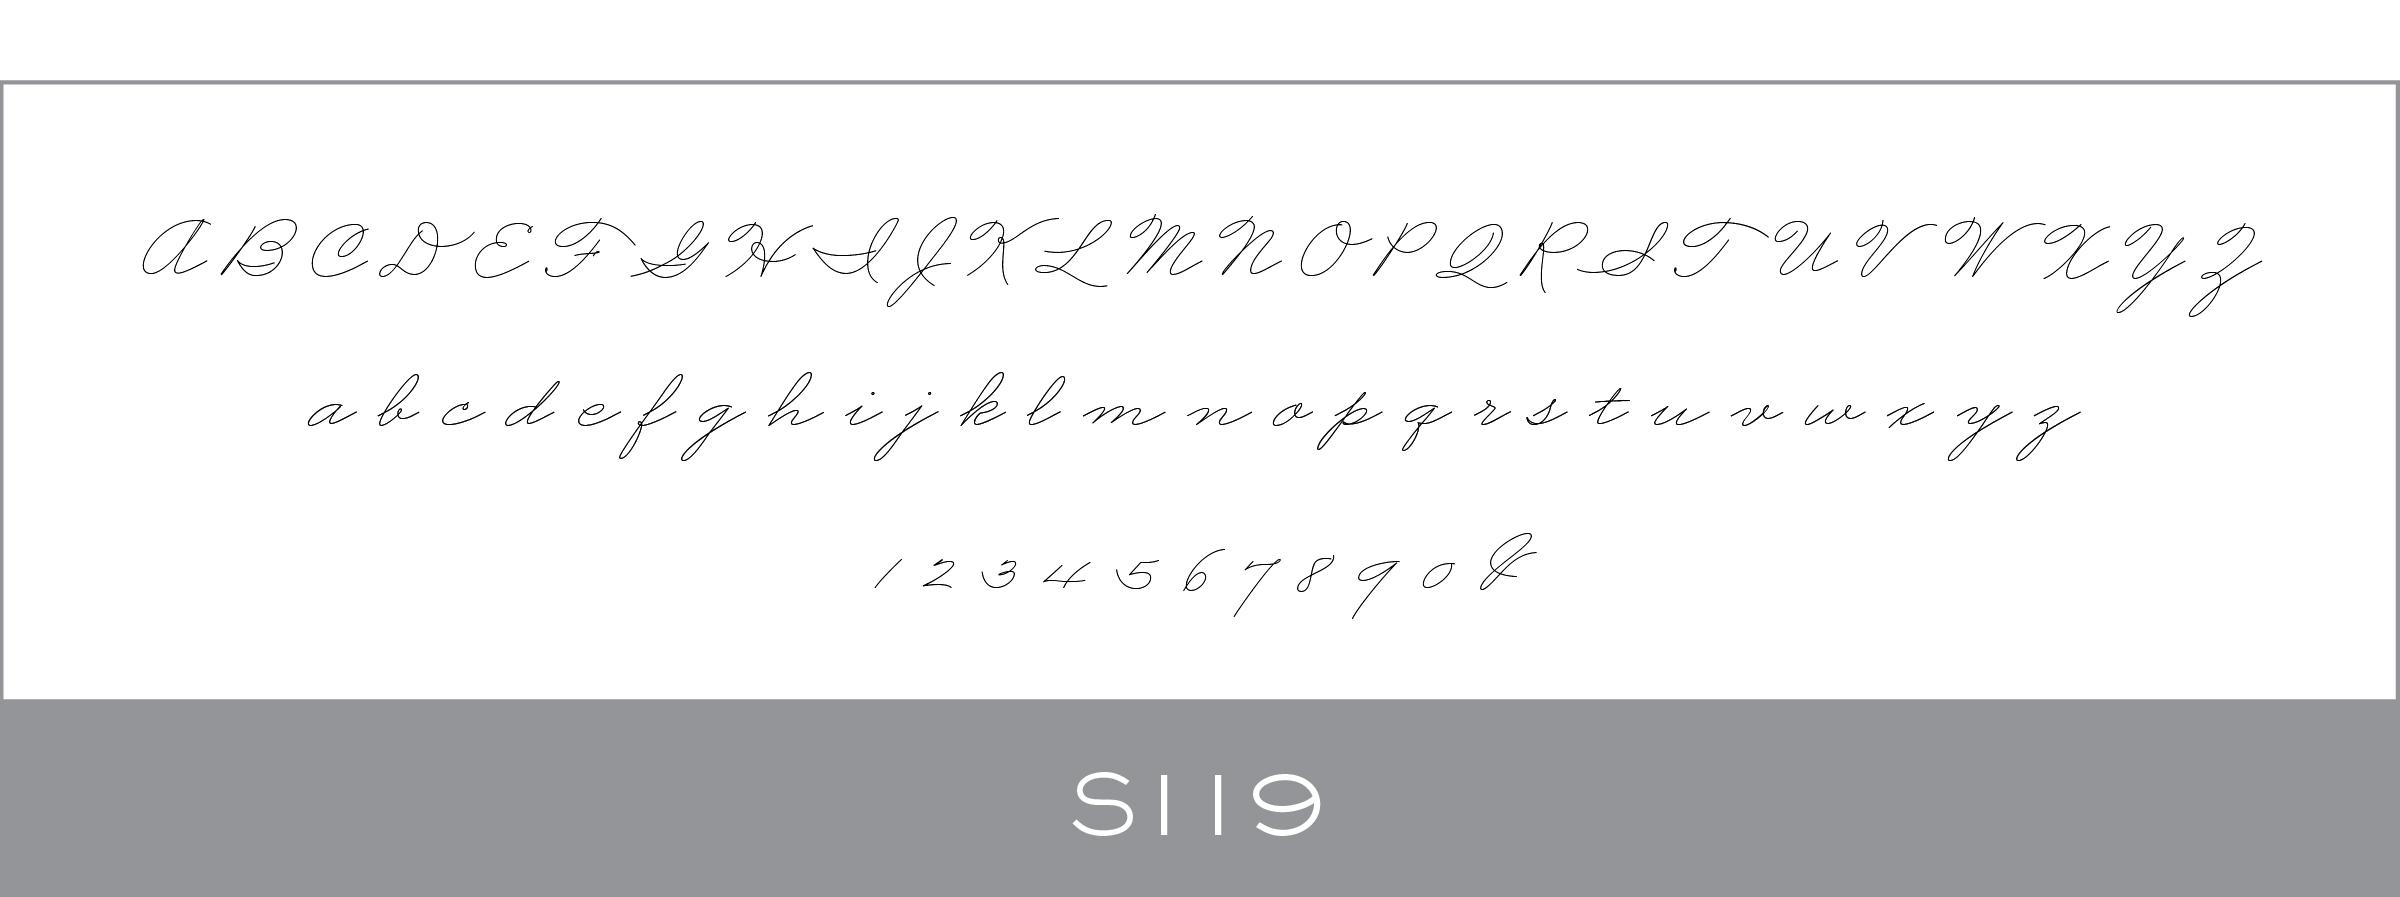 S119_Haute_Papier_Font.jpg